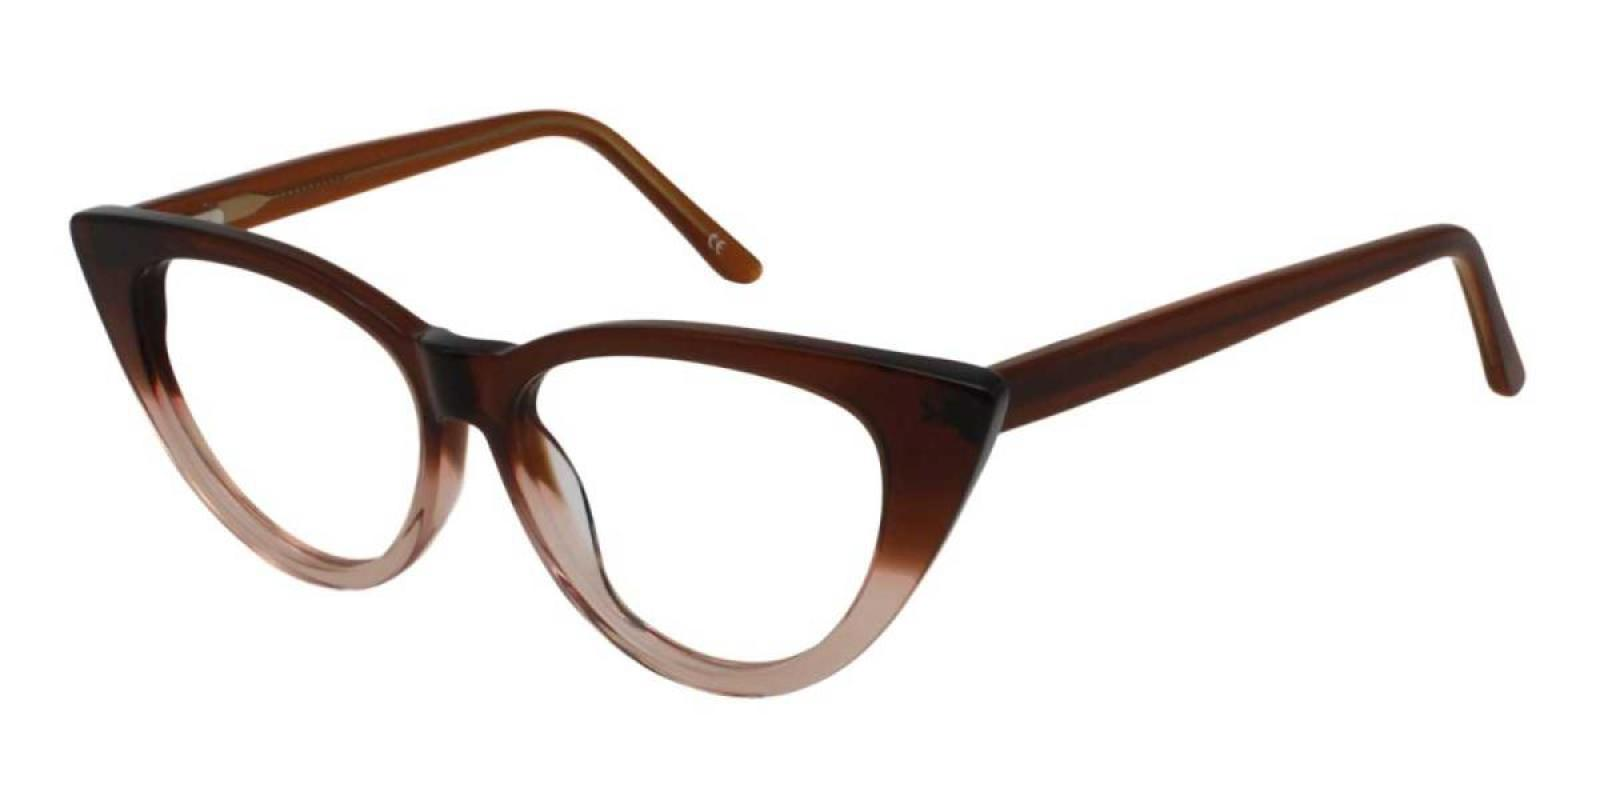 Charm-Brown-Cat-Acetate-Eyeglasses-additional1